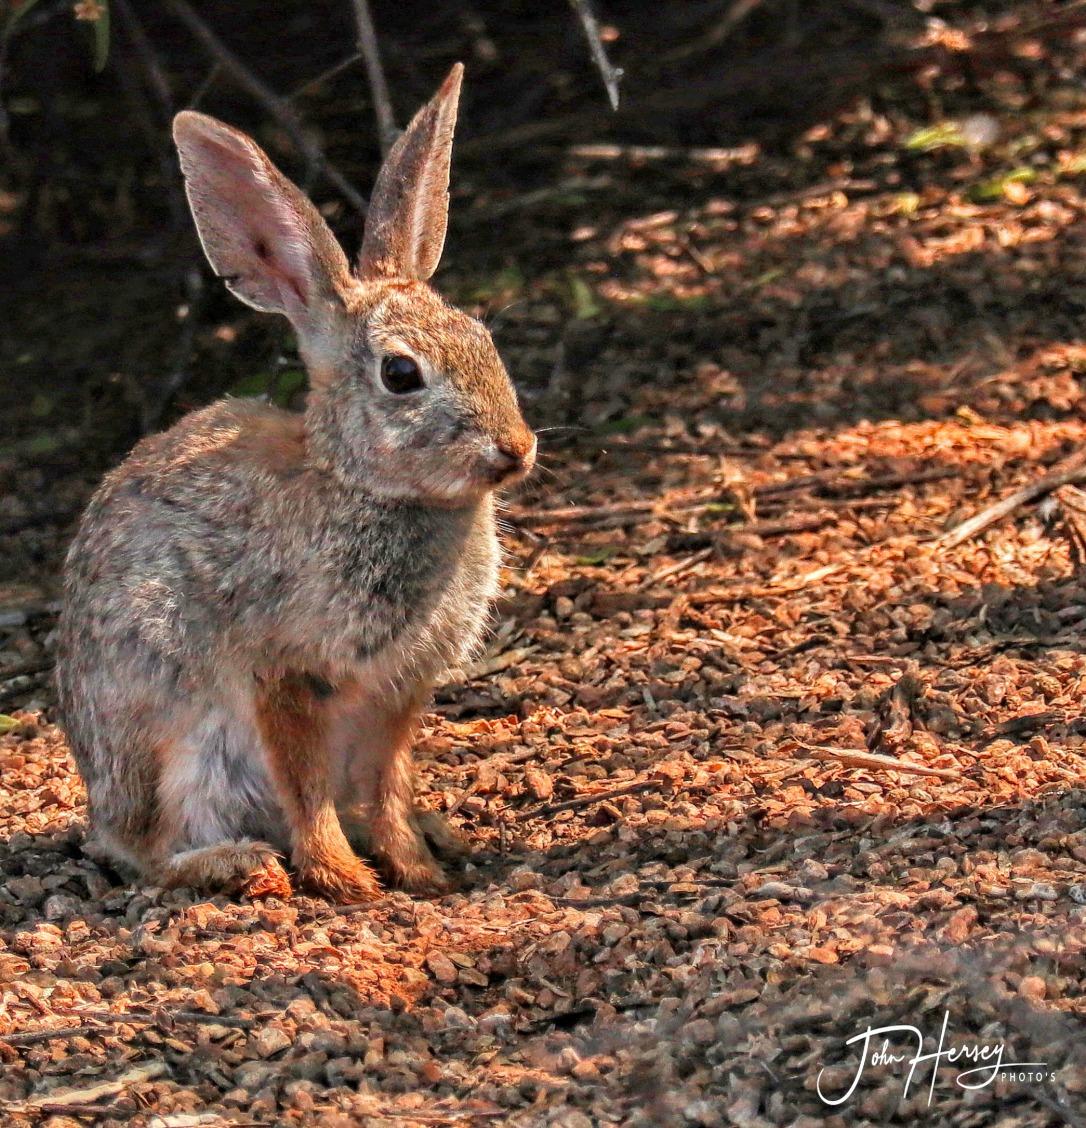 AZ Reparian_2020 Apr 17_bunny_edited-2